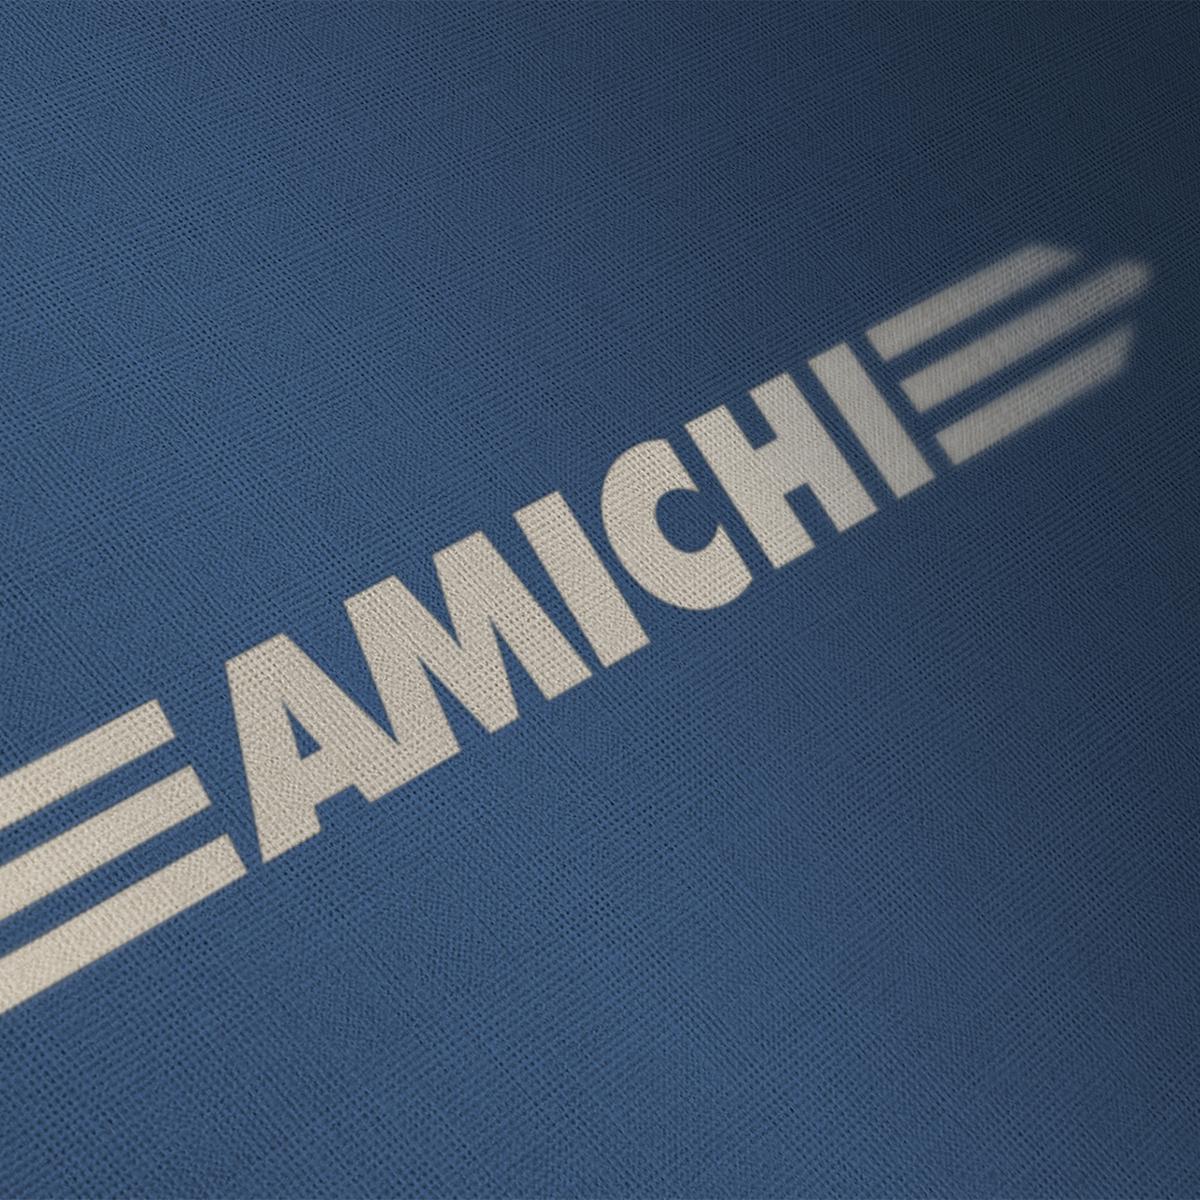 Amichi Viajes / Argentina / Branding